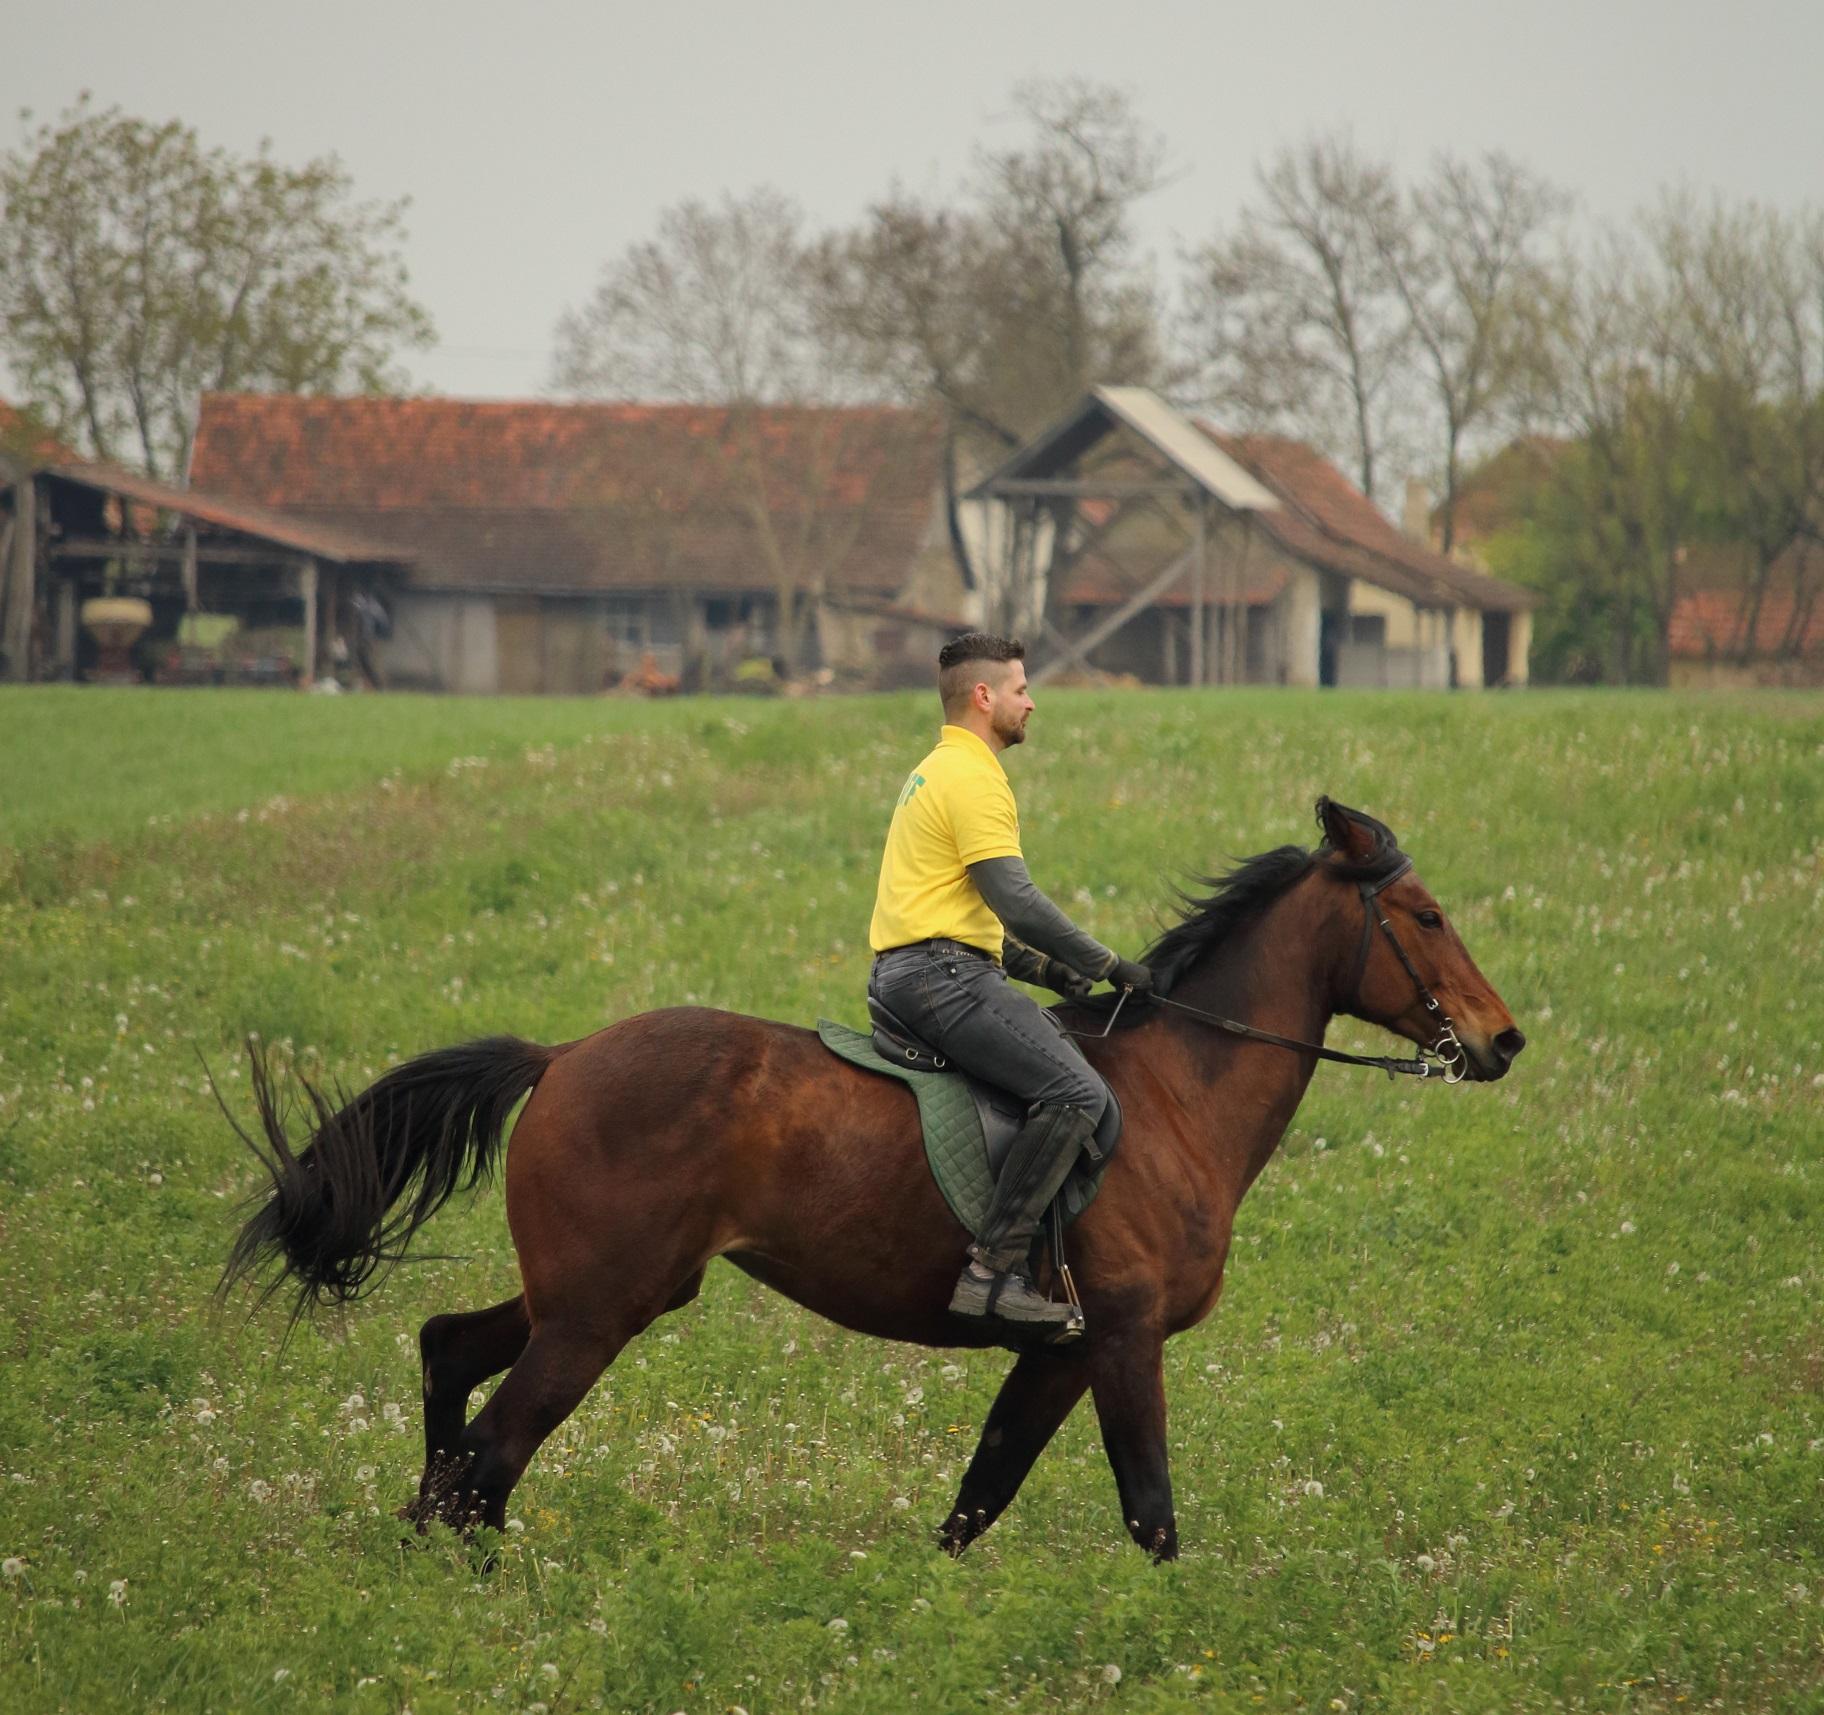 Horseback Riding Trail Across the Balkans, Grant fact Sheet